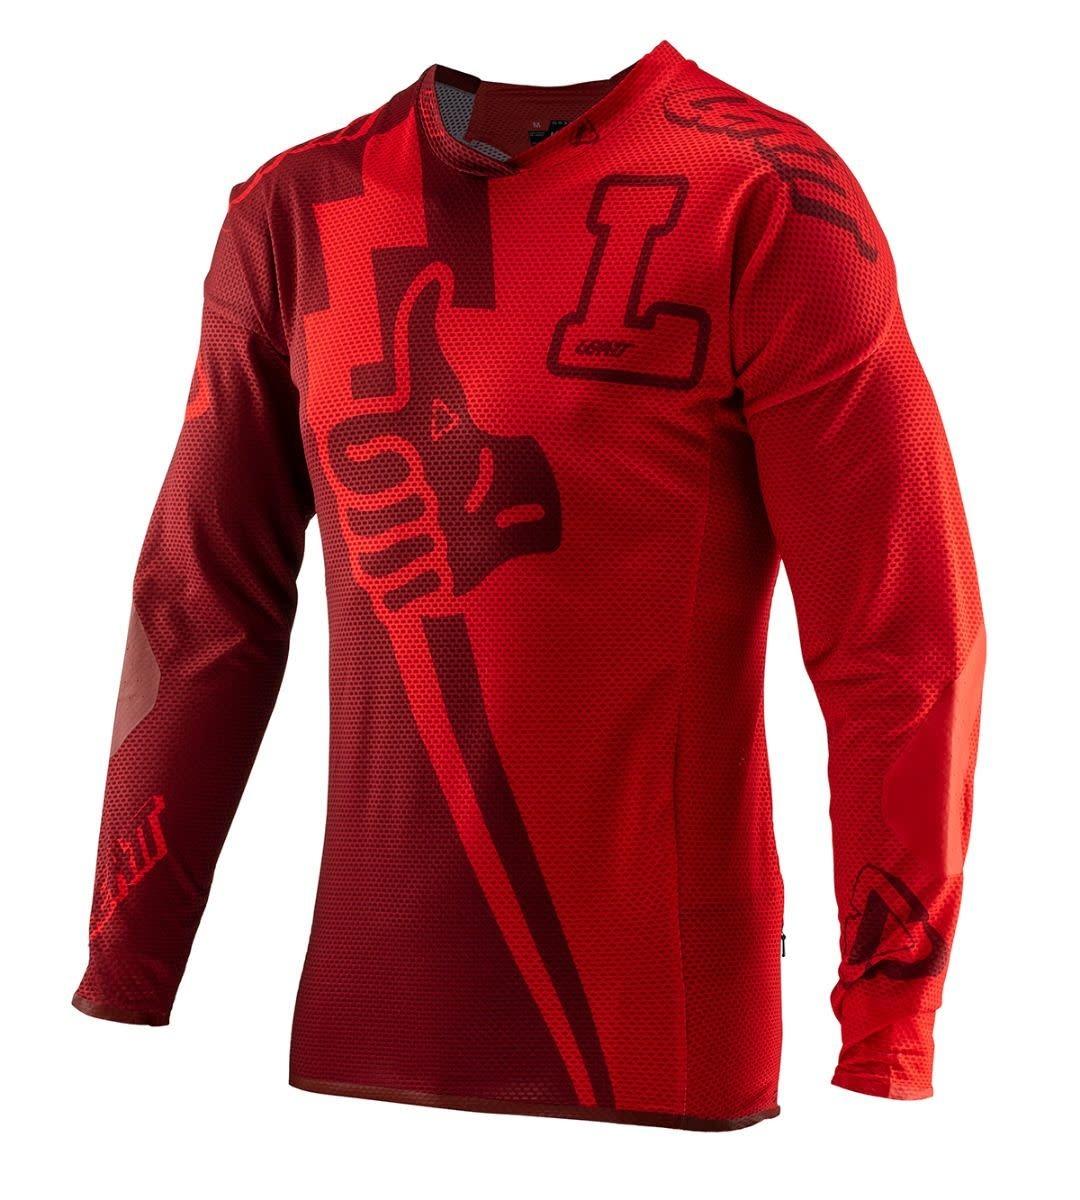 Leatt Leatt Jersey DBX 4.0 UltraWeld #L Stadium Ruby